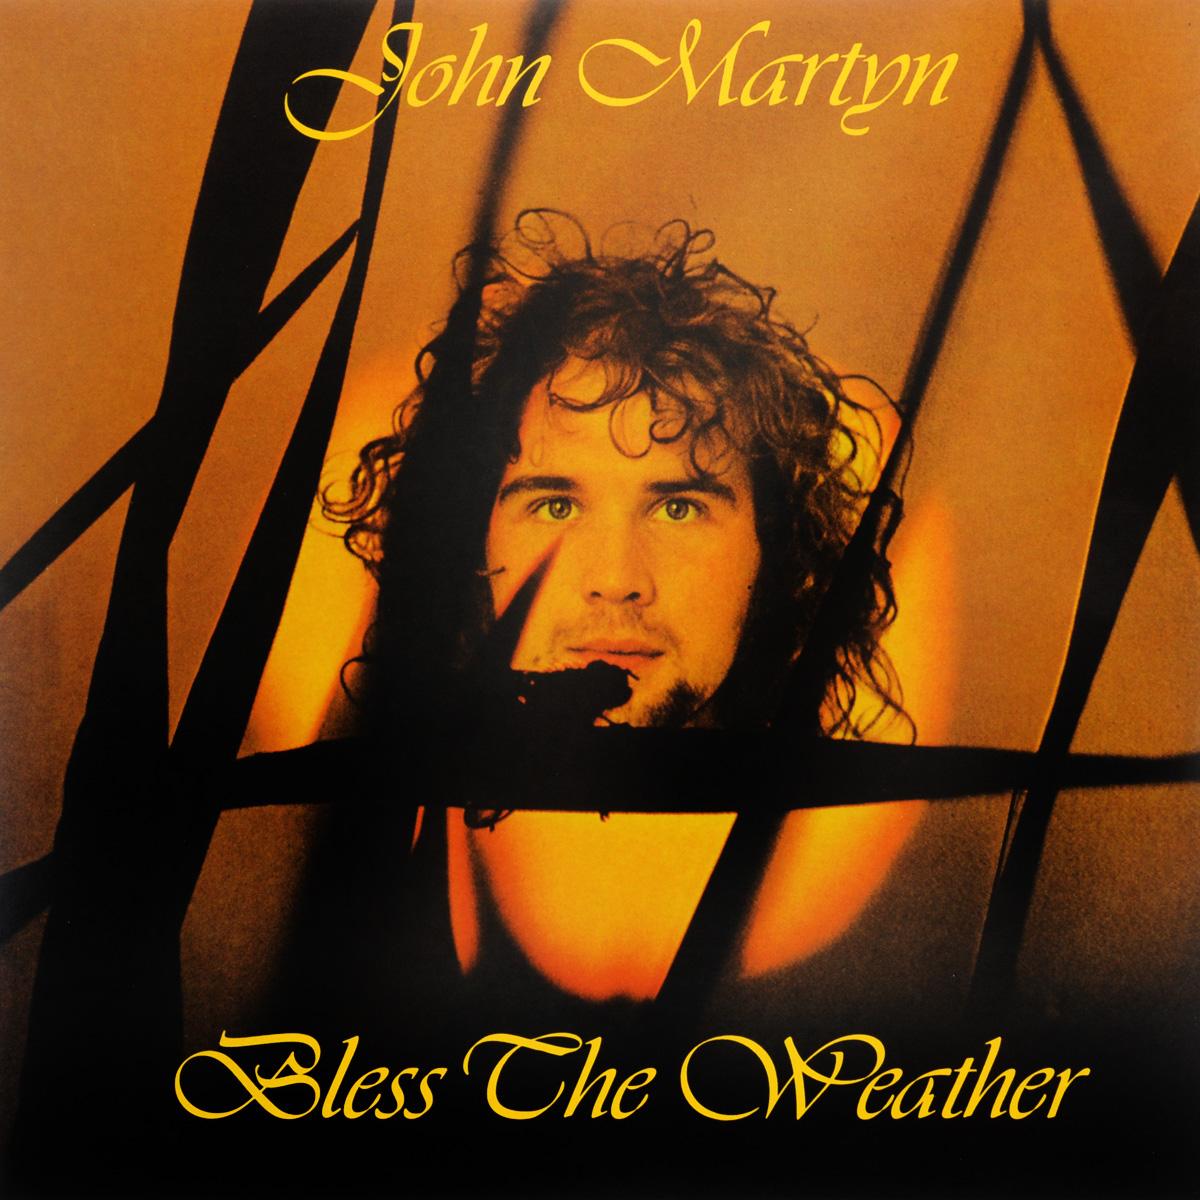 Джон Мартин John Martyn. Bless The Weather (LP) джон мартин john martyn sapphire 2 lp